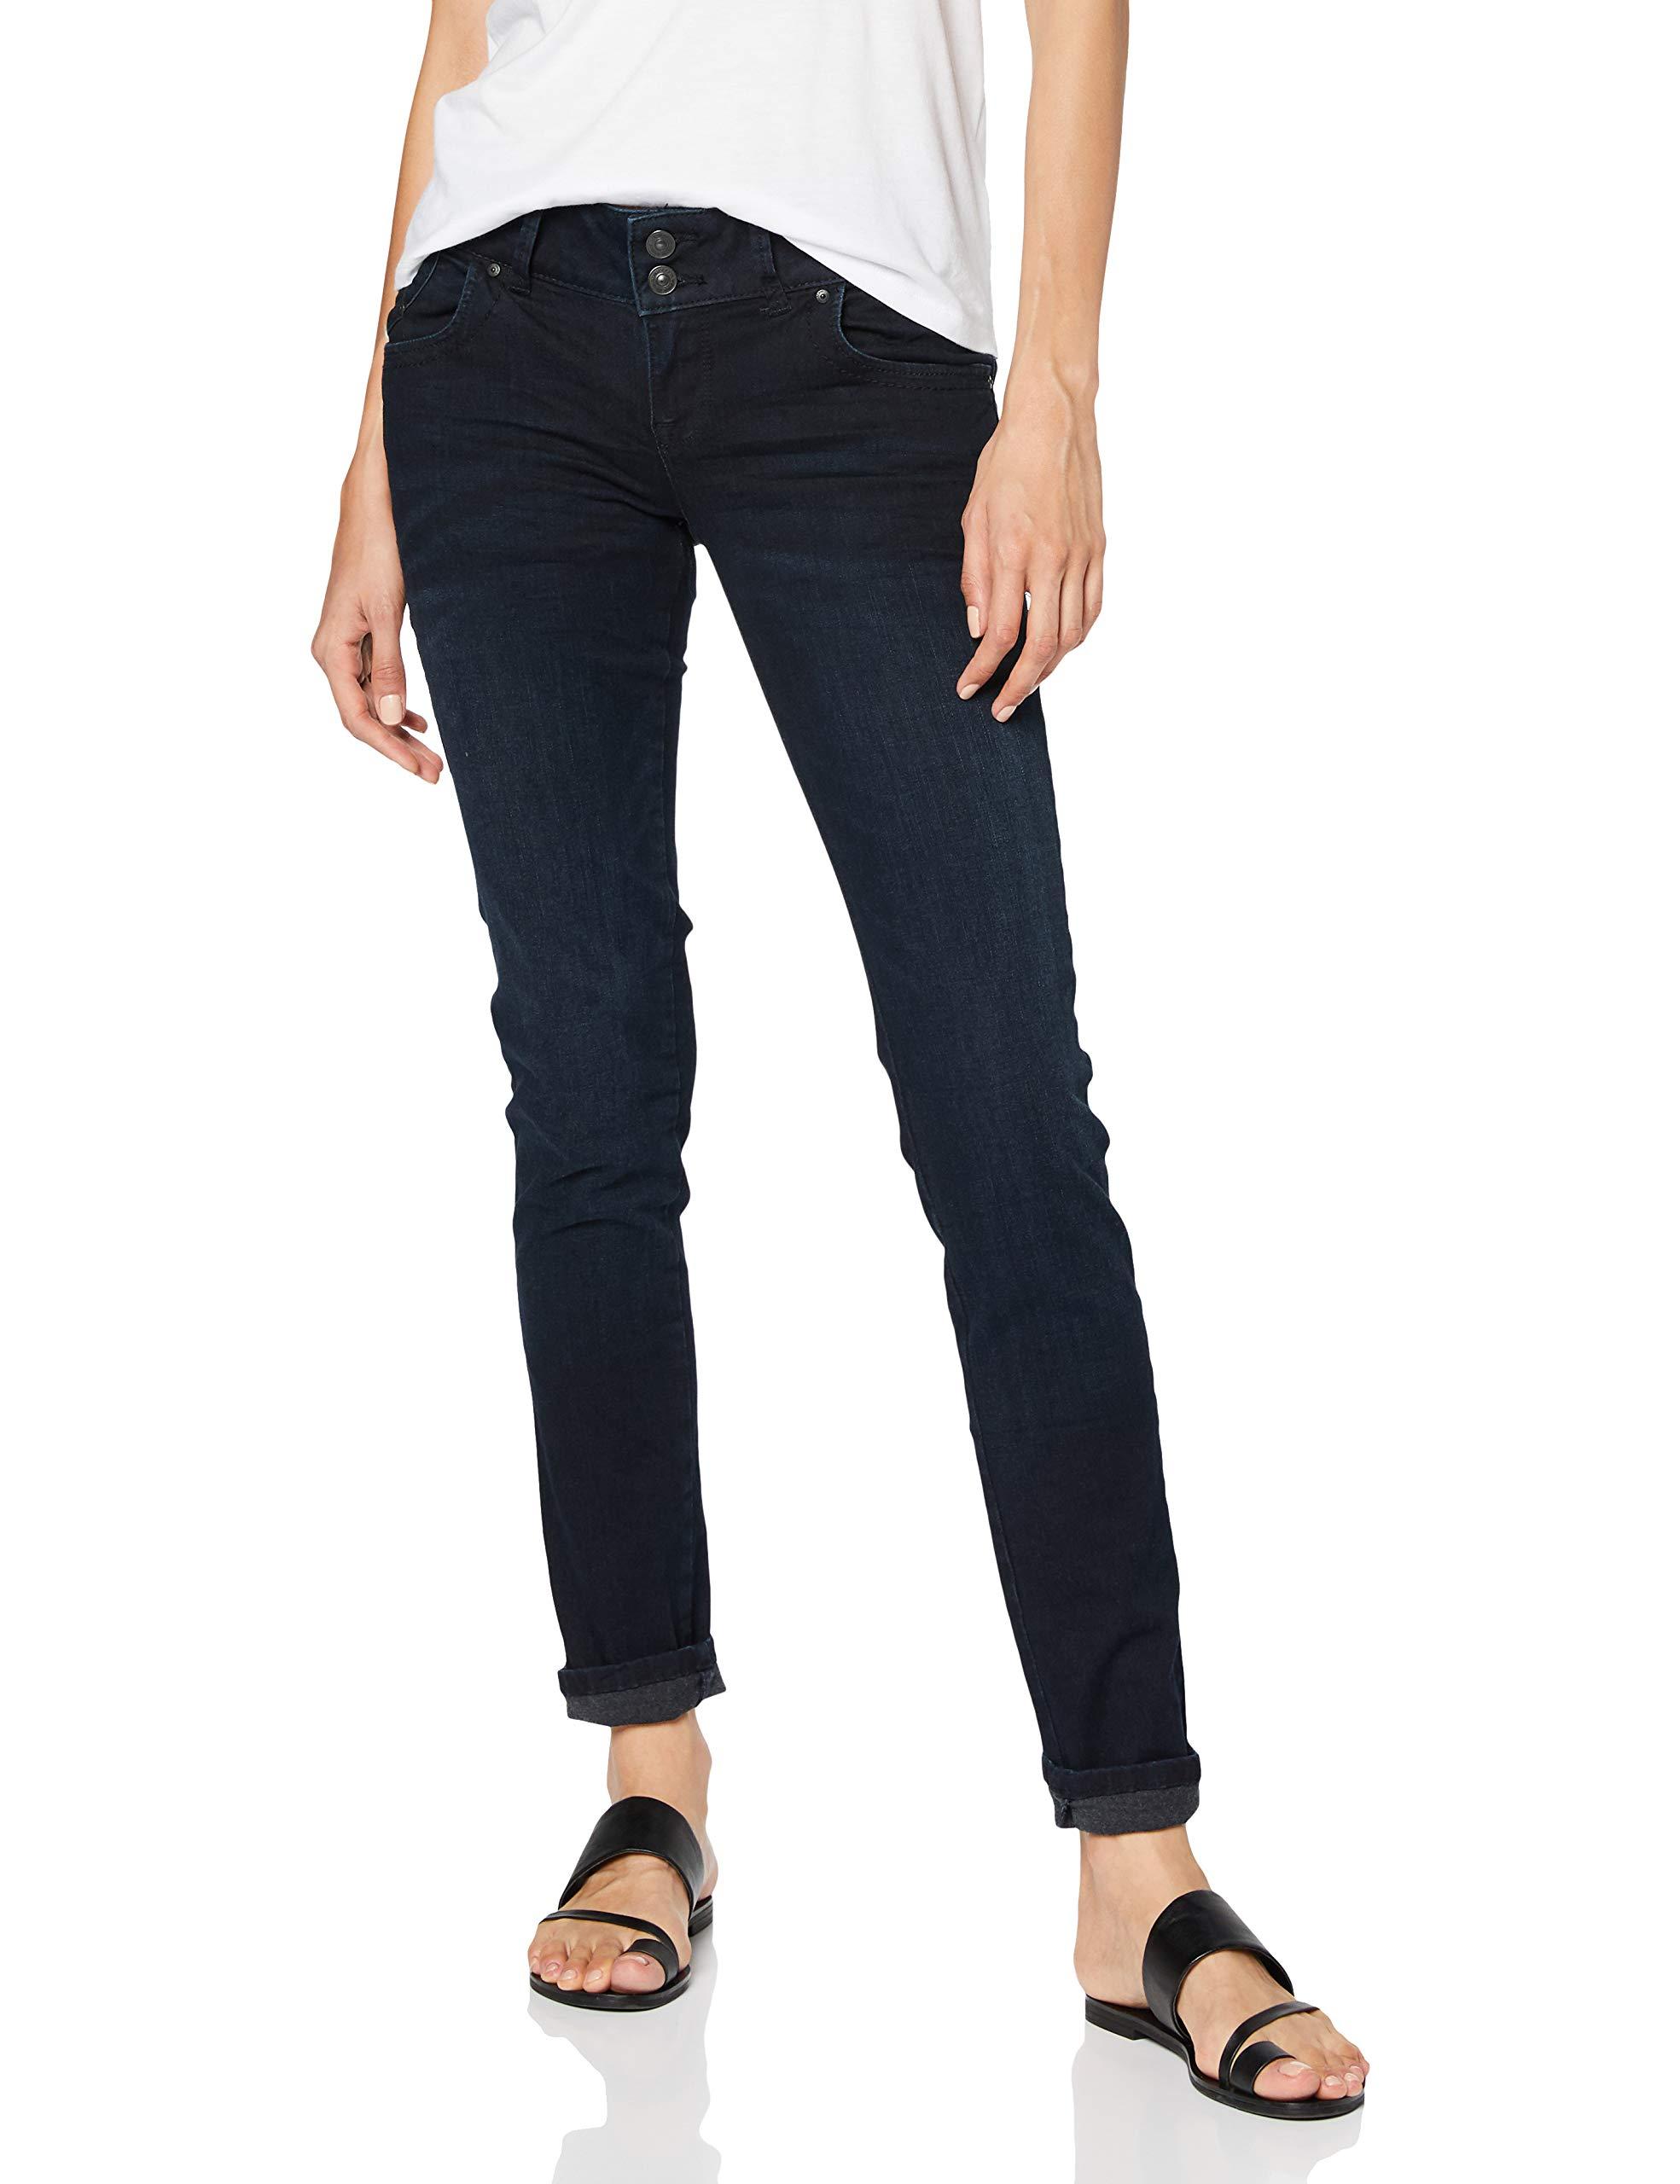 Jeans Jean 30Femme SlimBleucoliann Ltb Molly Fabricant27 Wash 51890W27 l30taille Oyv8mNn0w